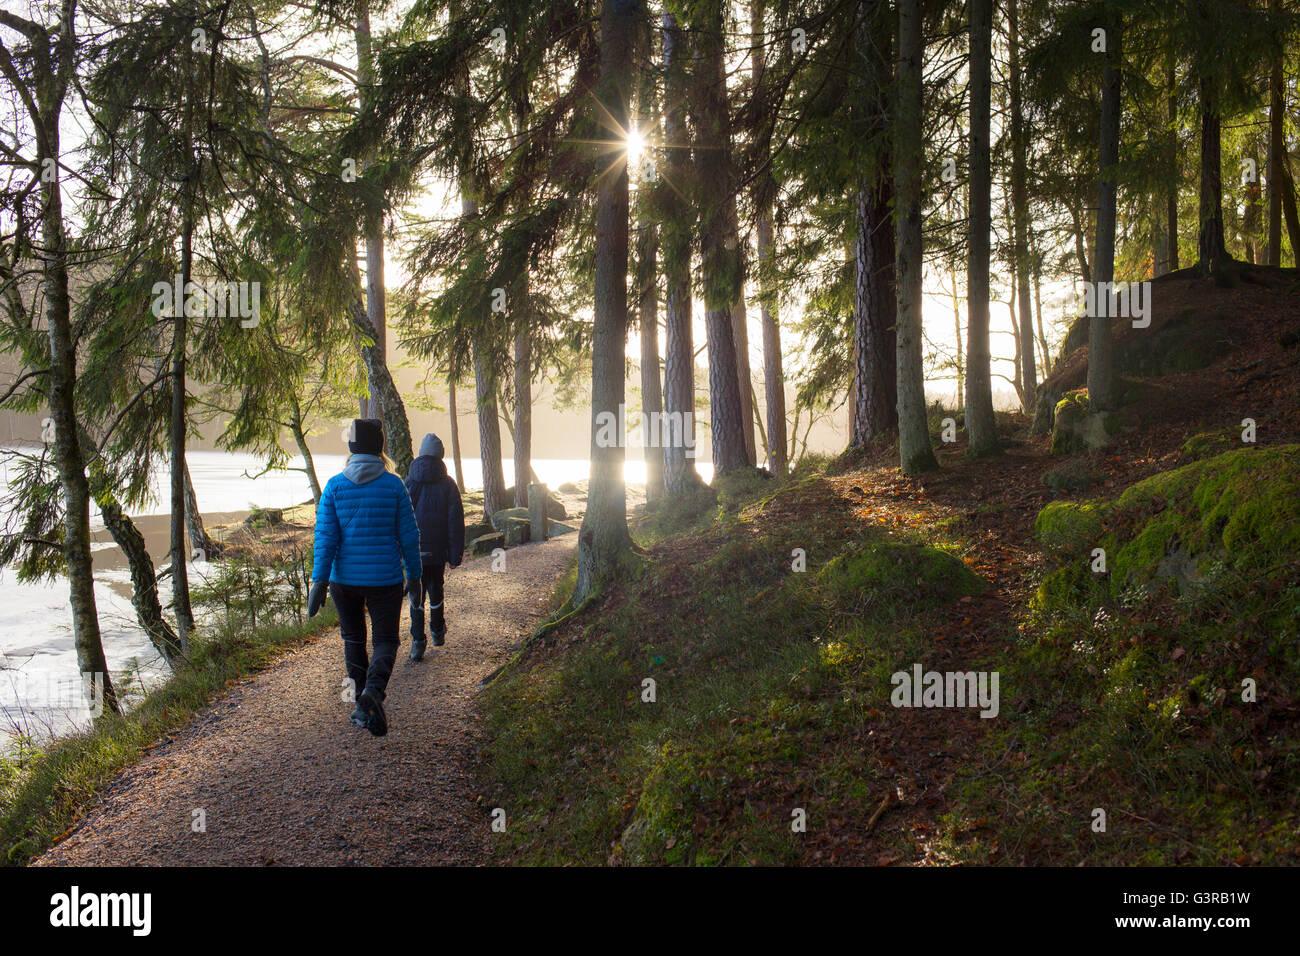 La Suède, Vastergotland, Lerum, Stamsjon, Mère et fils (12 et 13) Balade en forêt Photo Stock